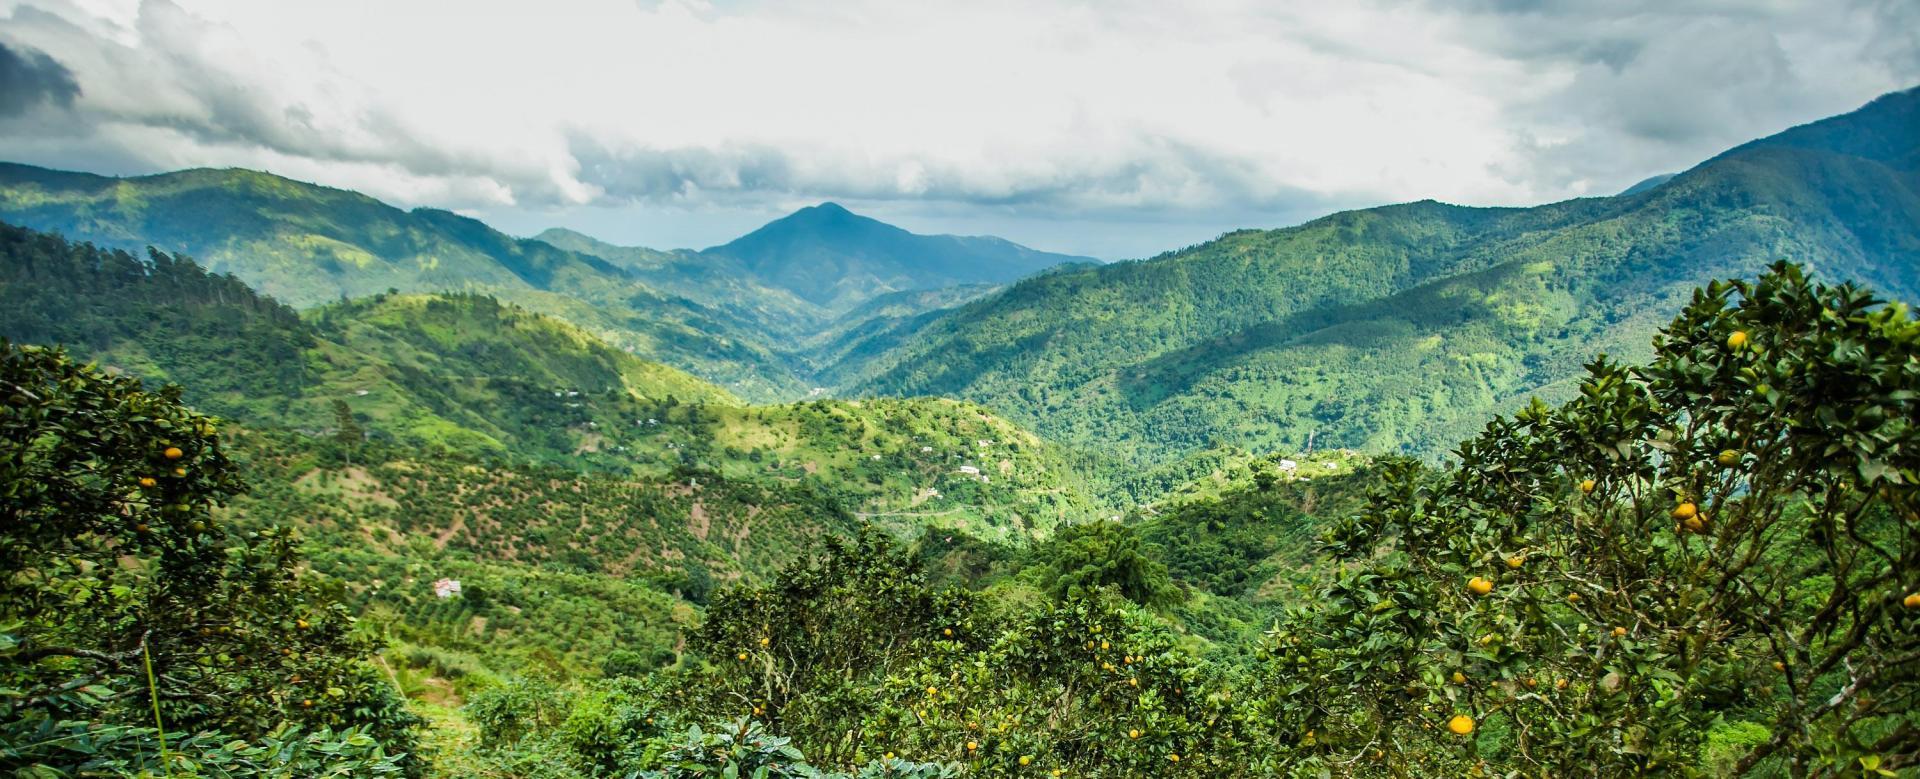 Trekking Jamaïque : Coeur africain de la caraïbe